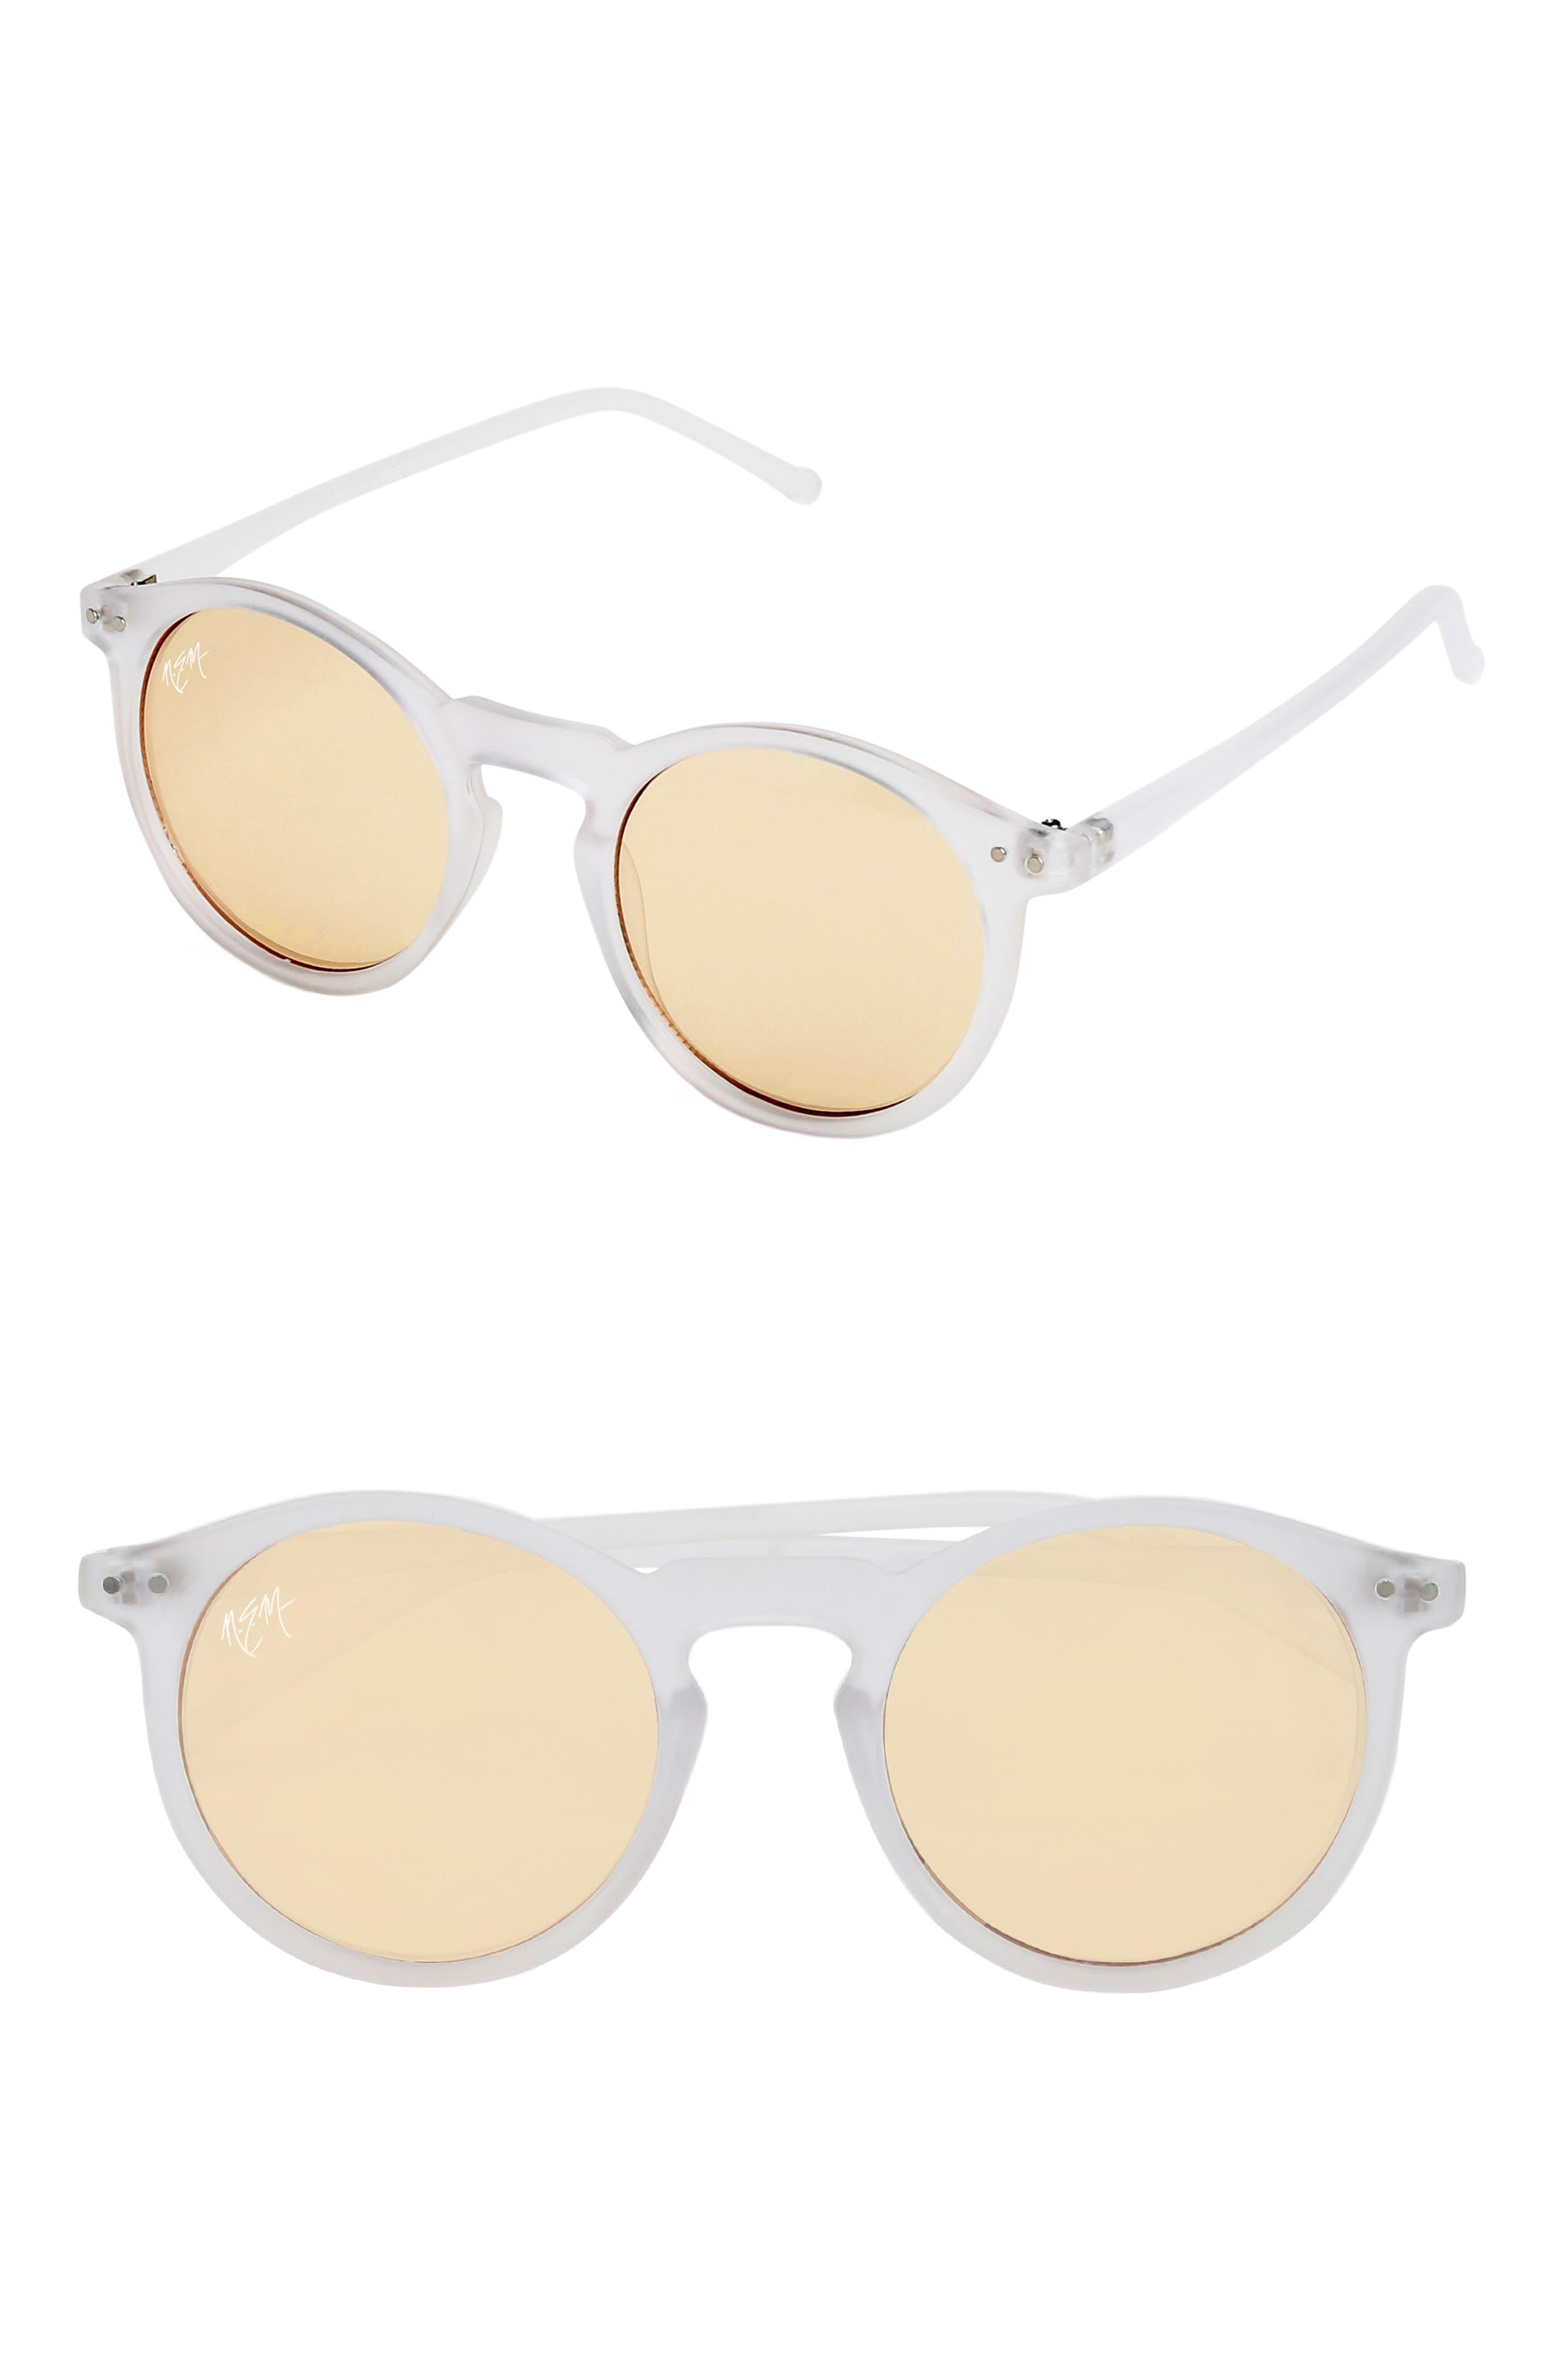 Nem 50Mm Mirrored Round Sunglasses - Clear Sky Blue/ Gold Tint